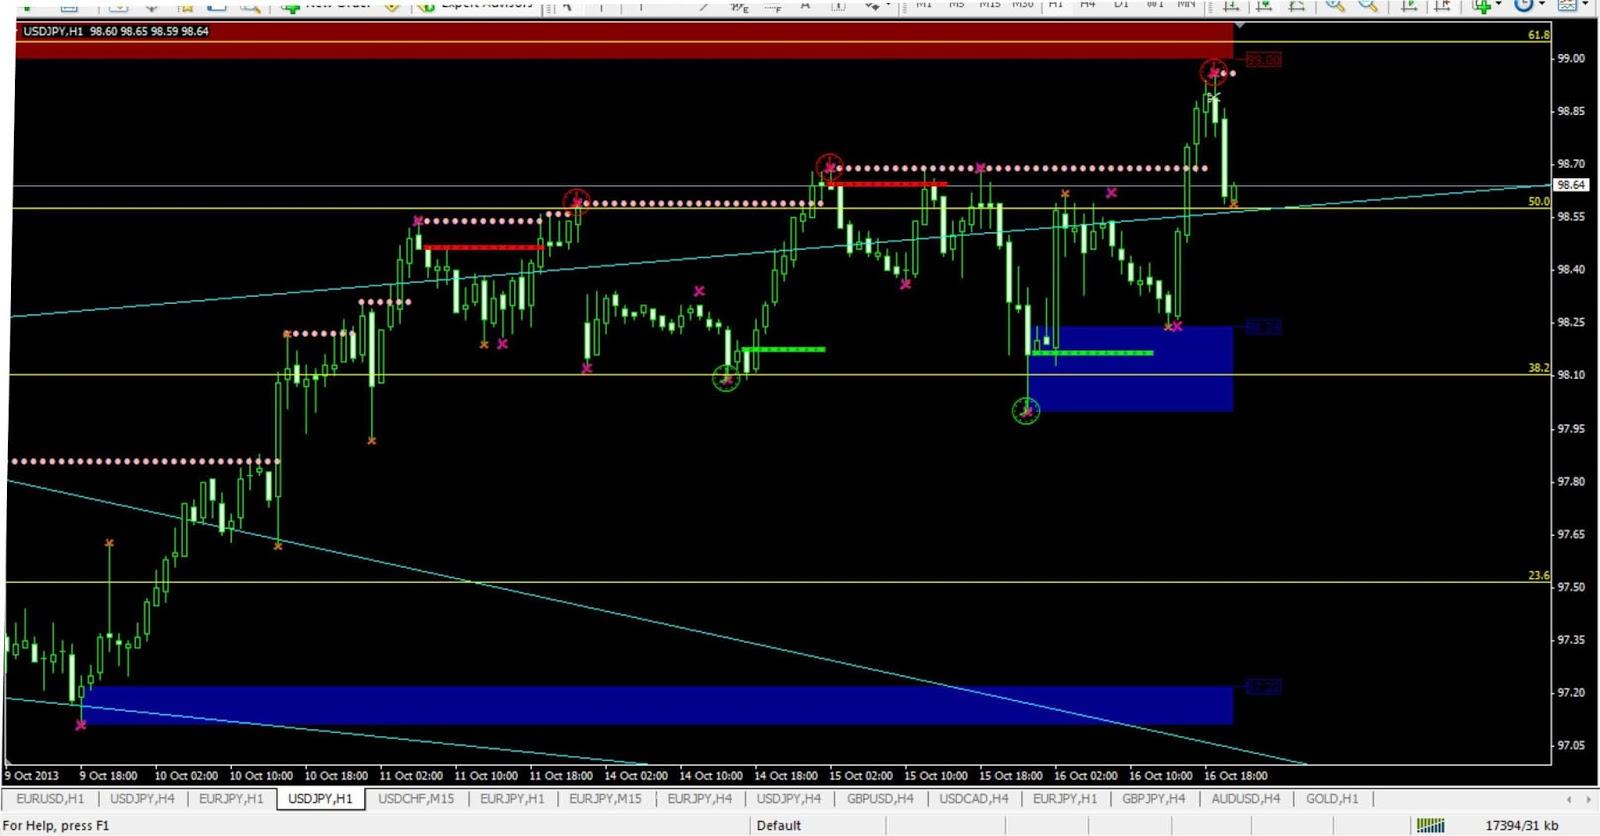 Strategi trader forex profesional